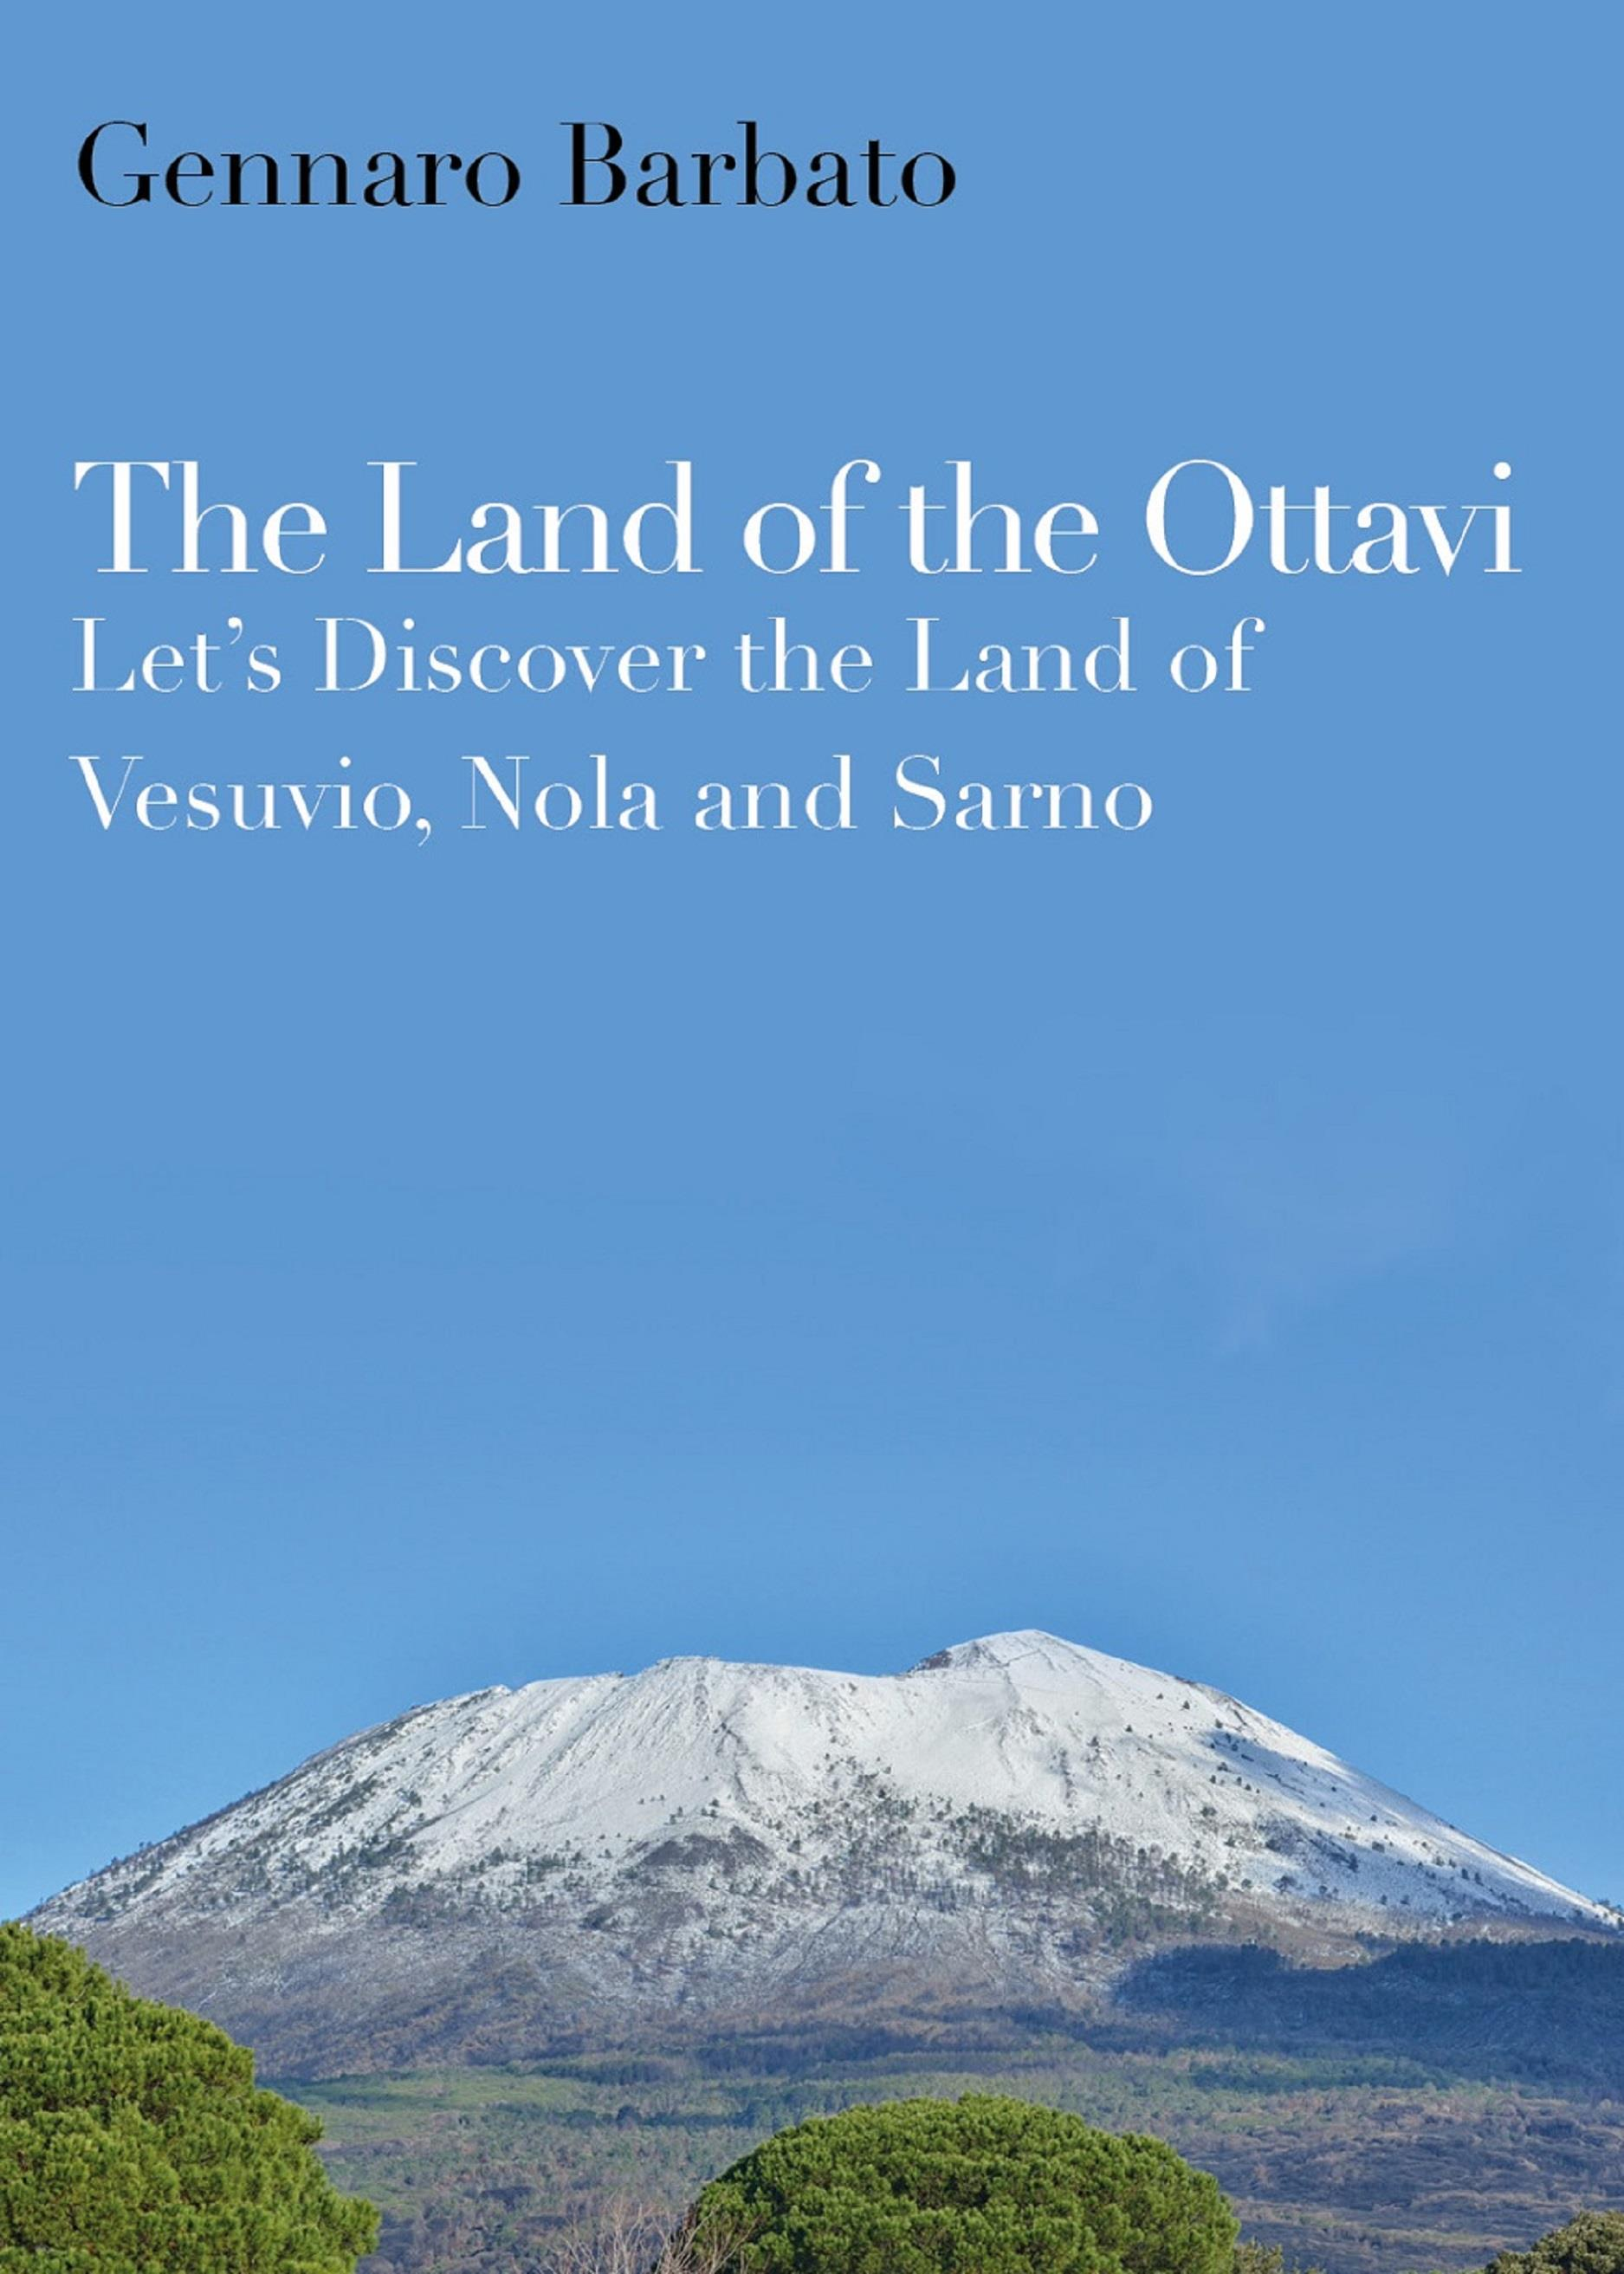 The Land of the Ottavi